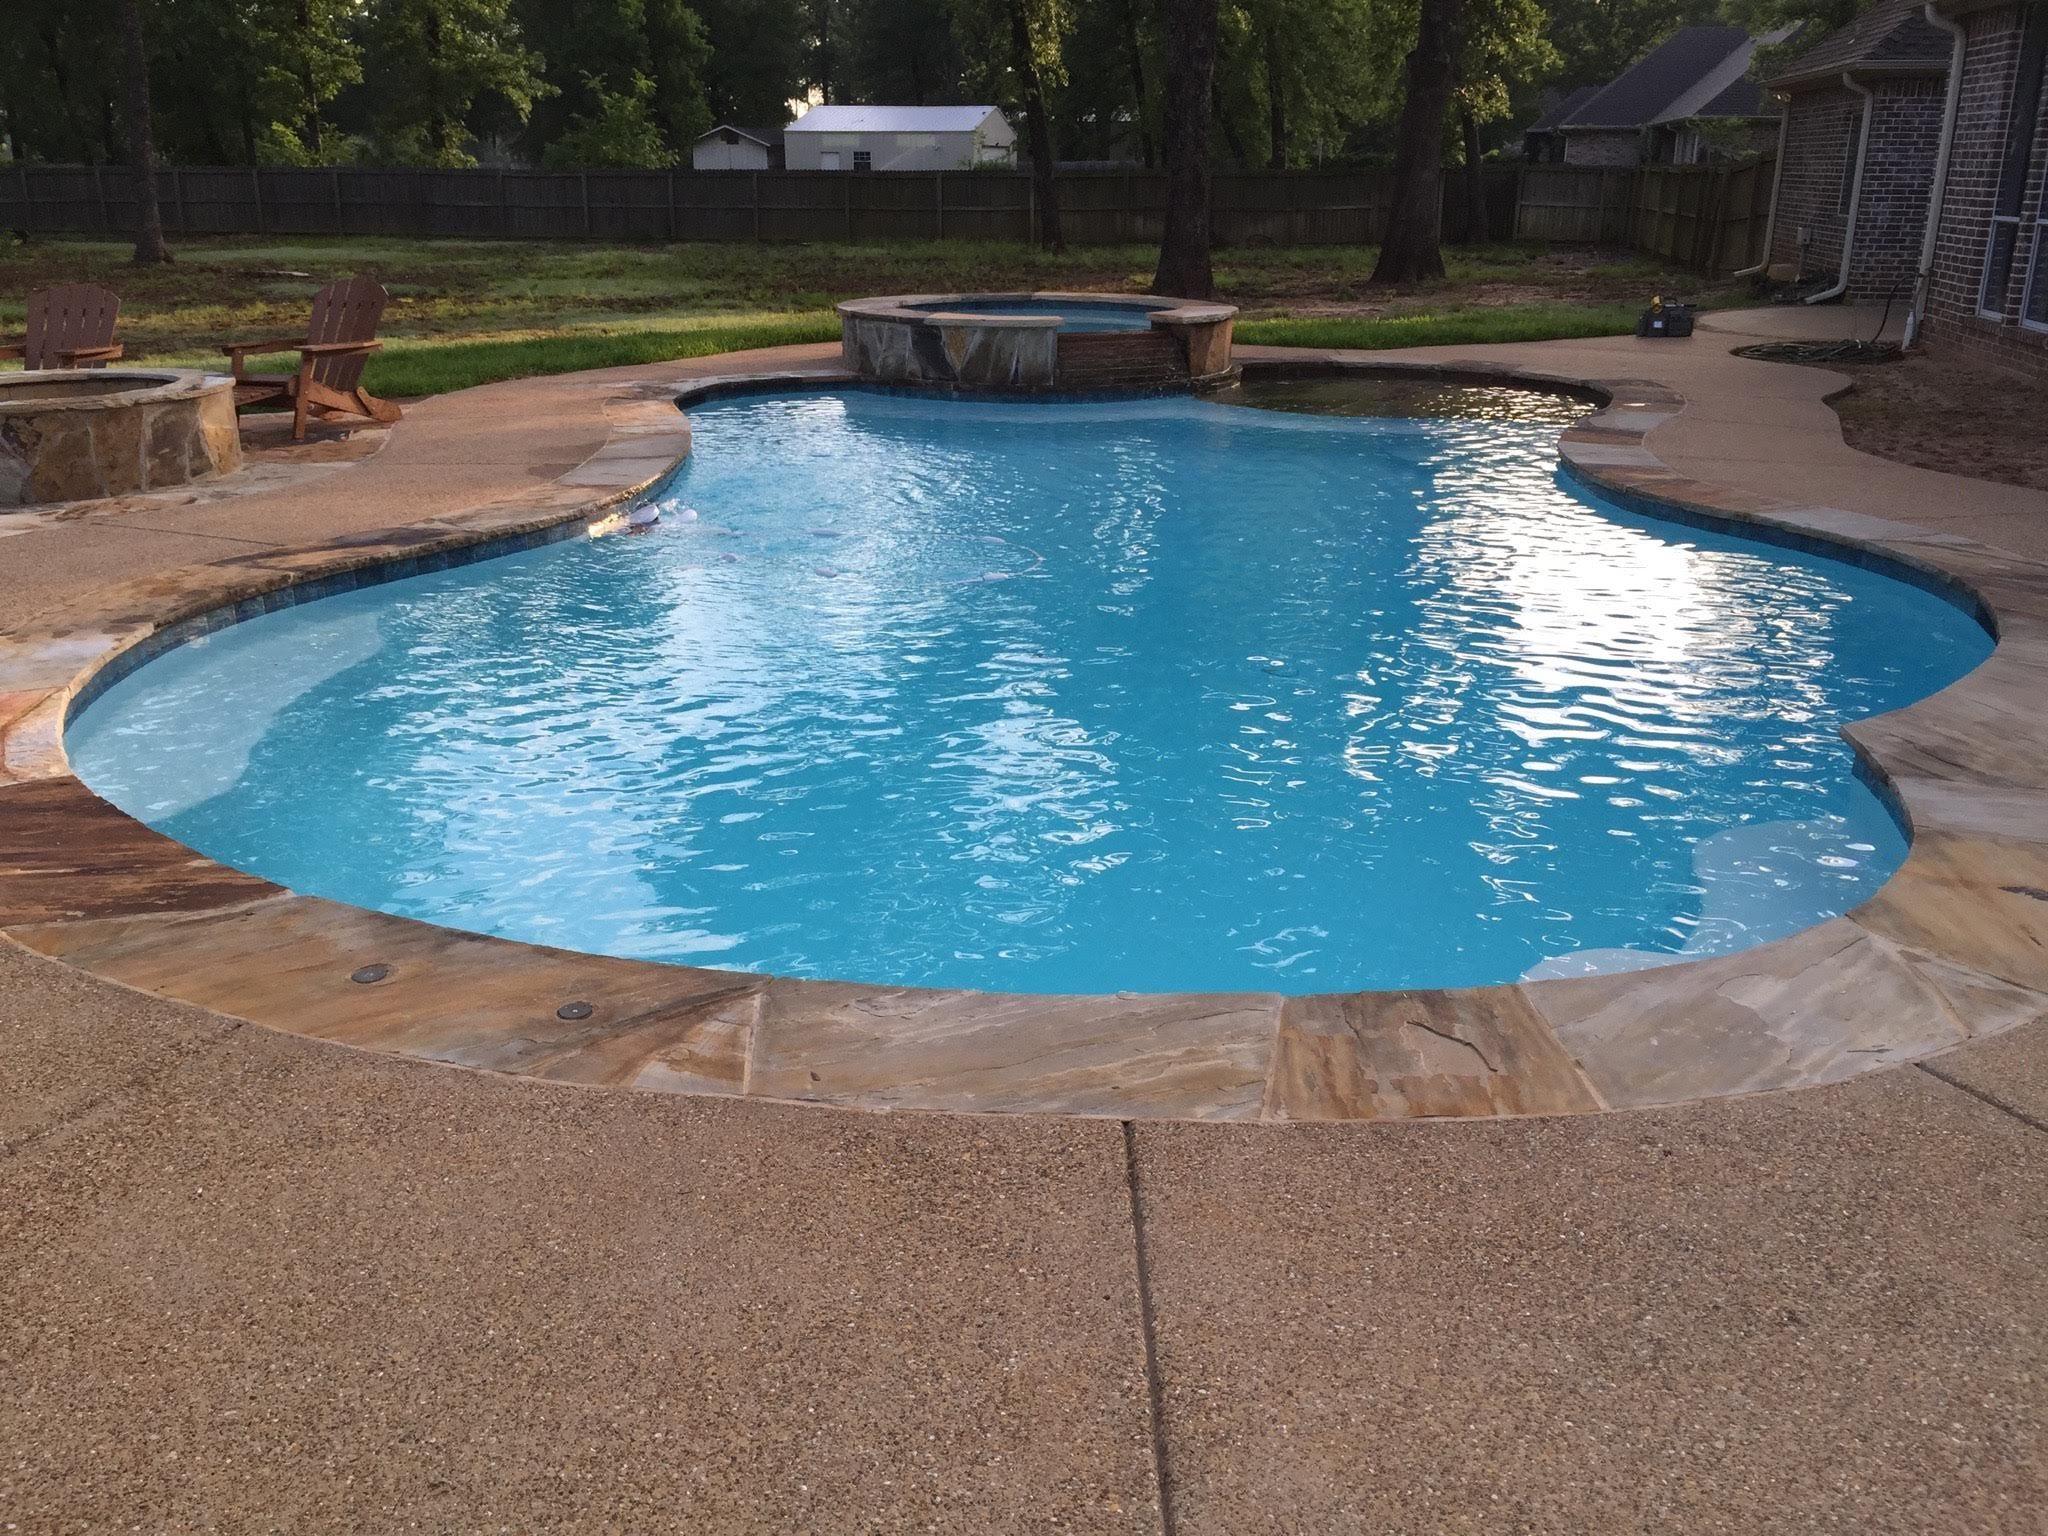 Inground Pools | Custom Pool Builder Tyler Texas | Gunite Pool  Construction, Above Ground Pool